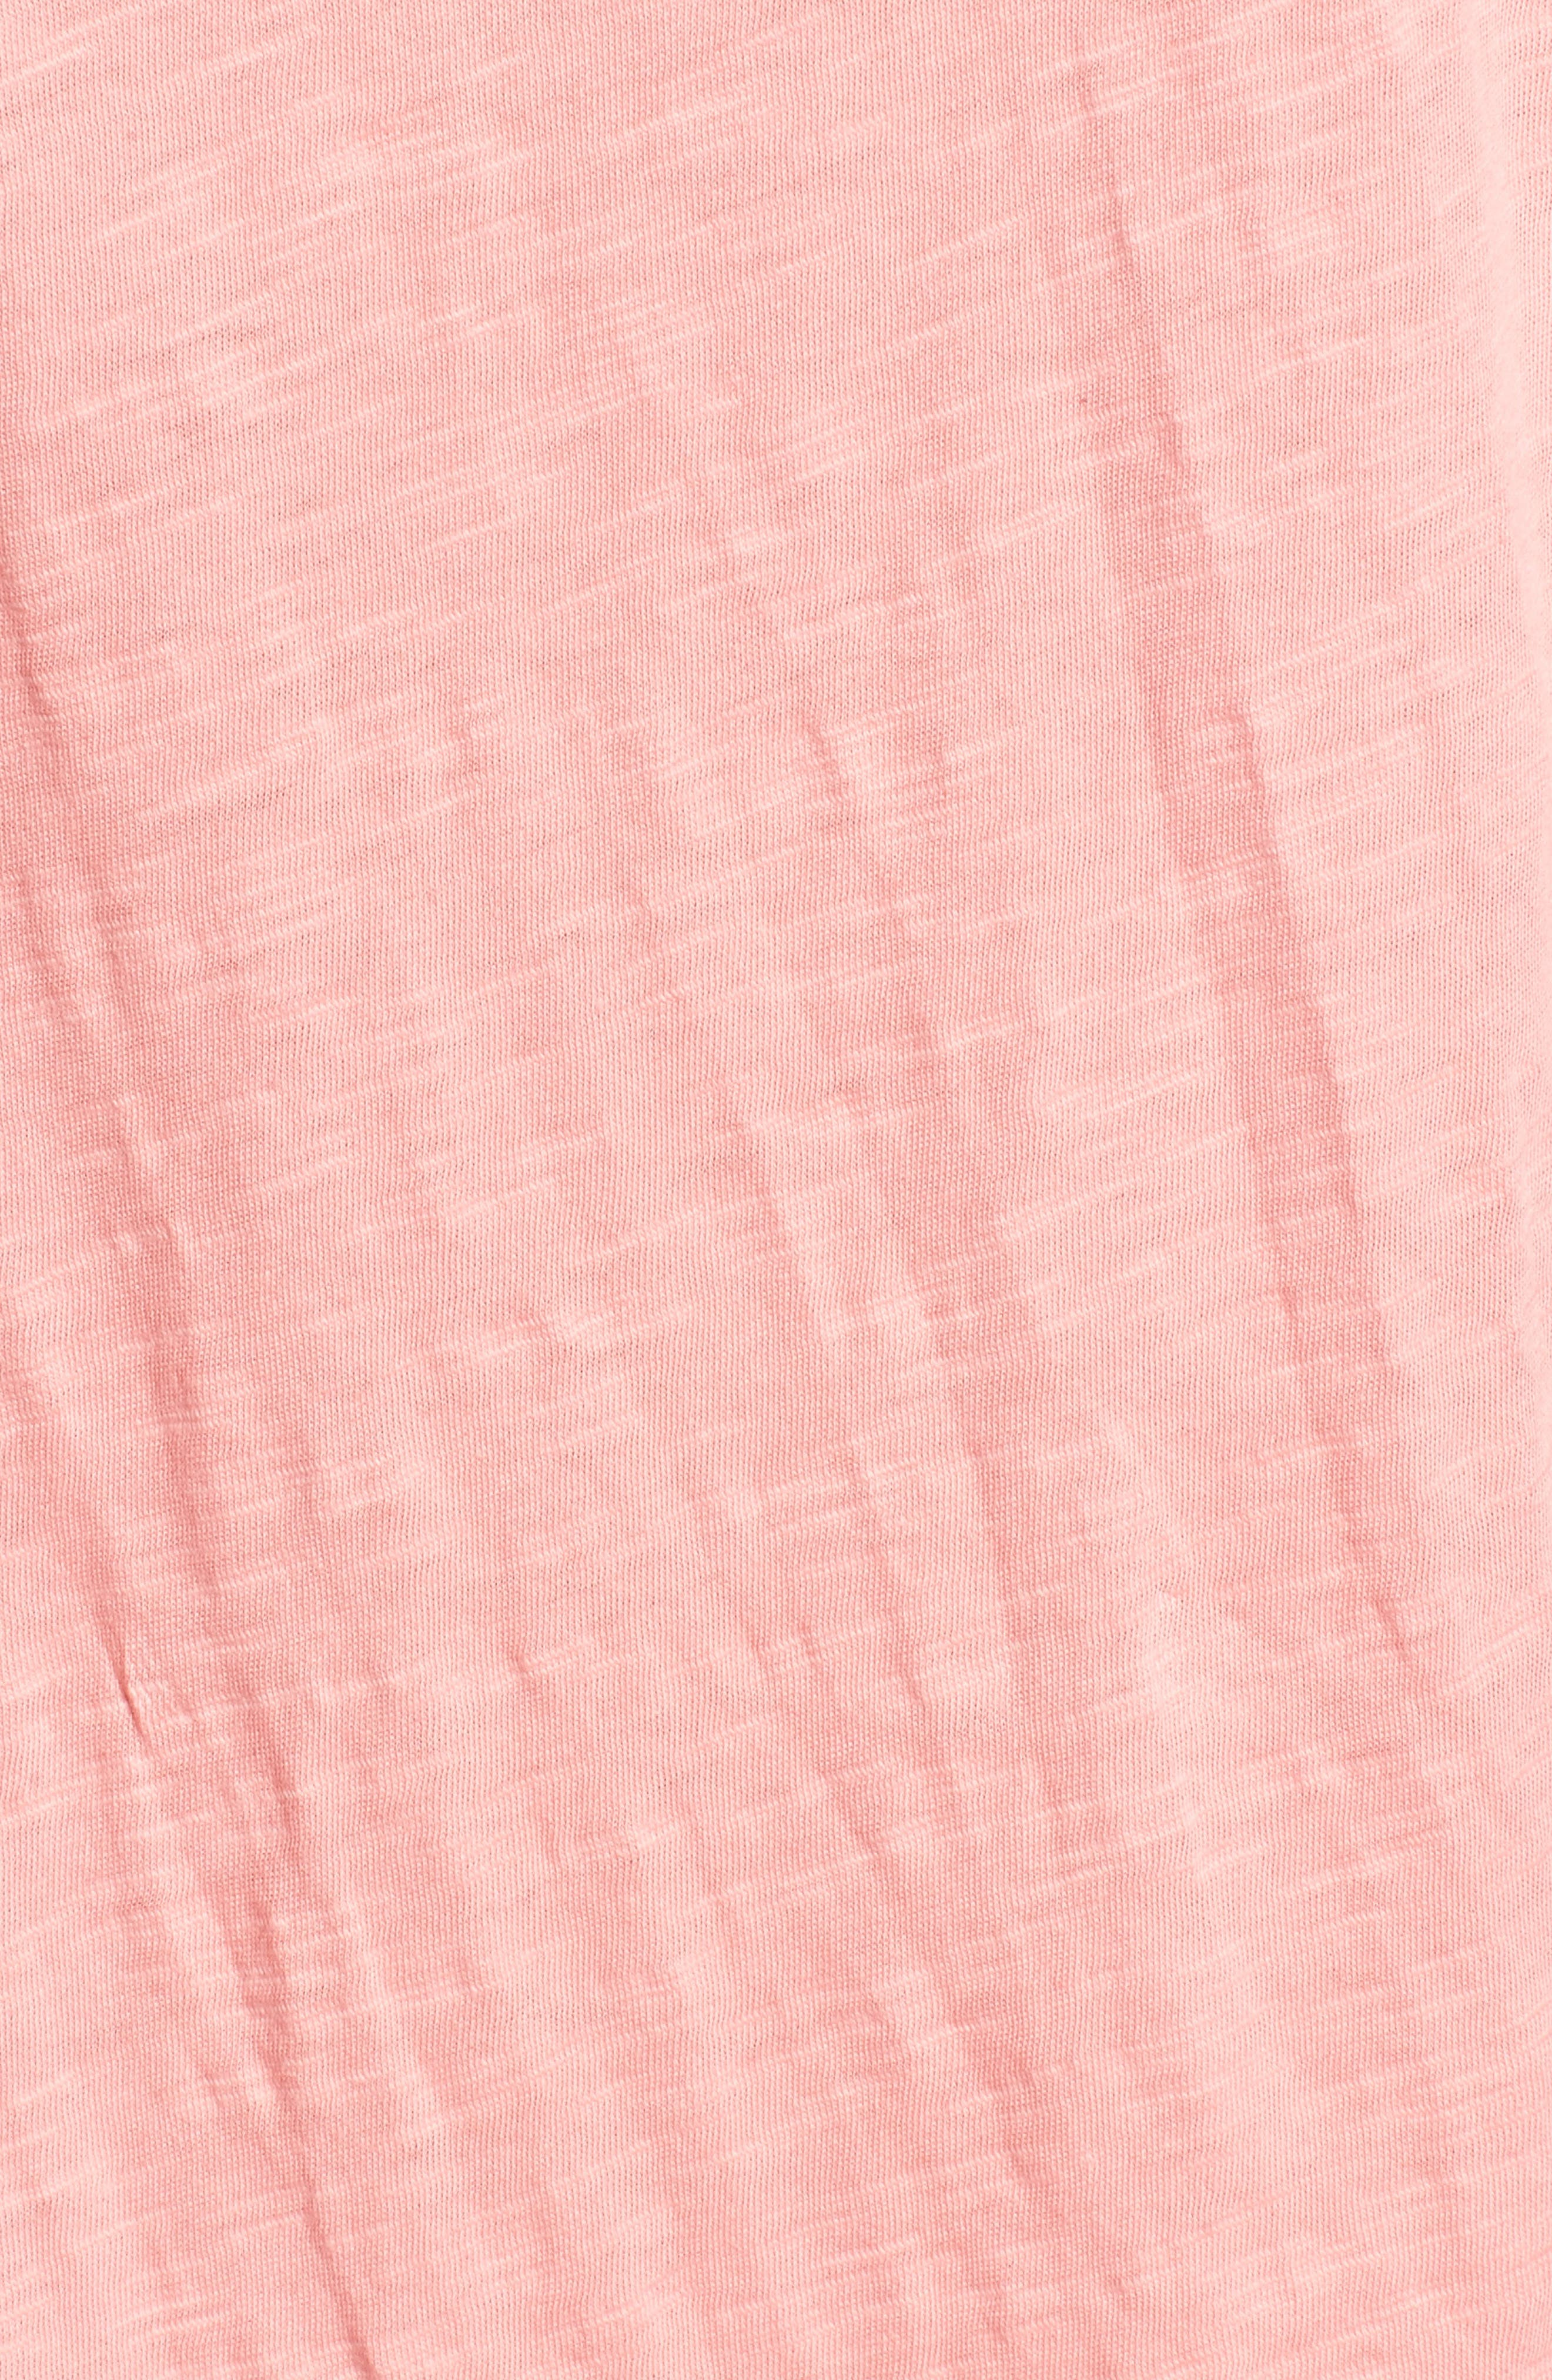 Flounce Short Sleeve Tee,                             Alternate thumbnail 15, color,